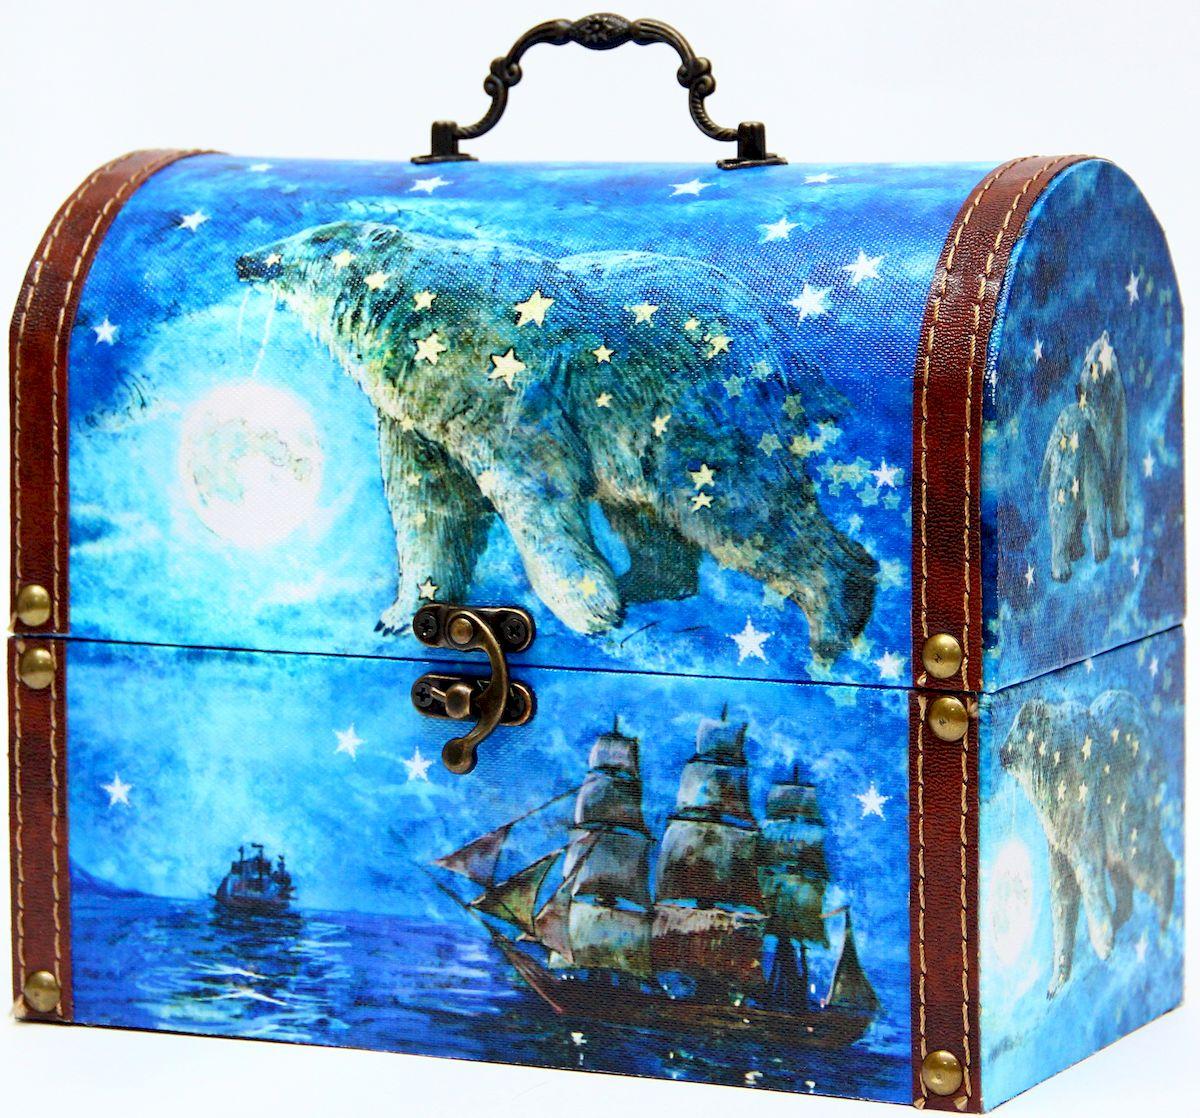 Шкатулка декоративная Magic Home Большая медведица, цвет: синий, 22 х 11 х 17,5 см шкатулки magic home шкатулка дождь в париже